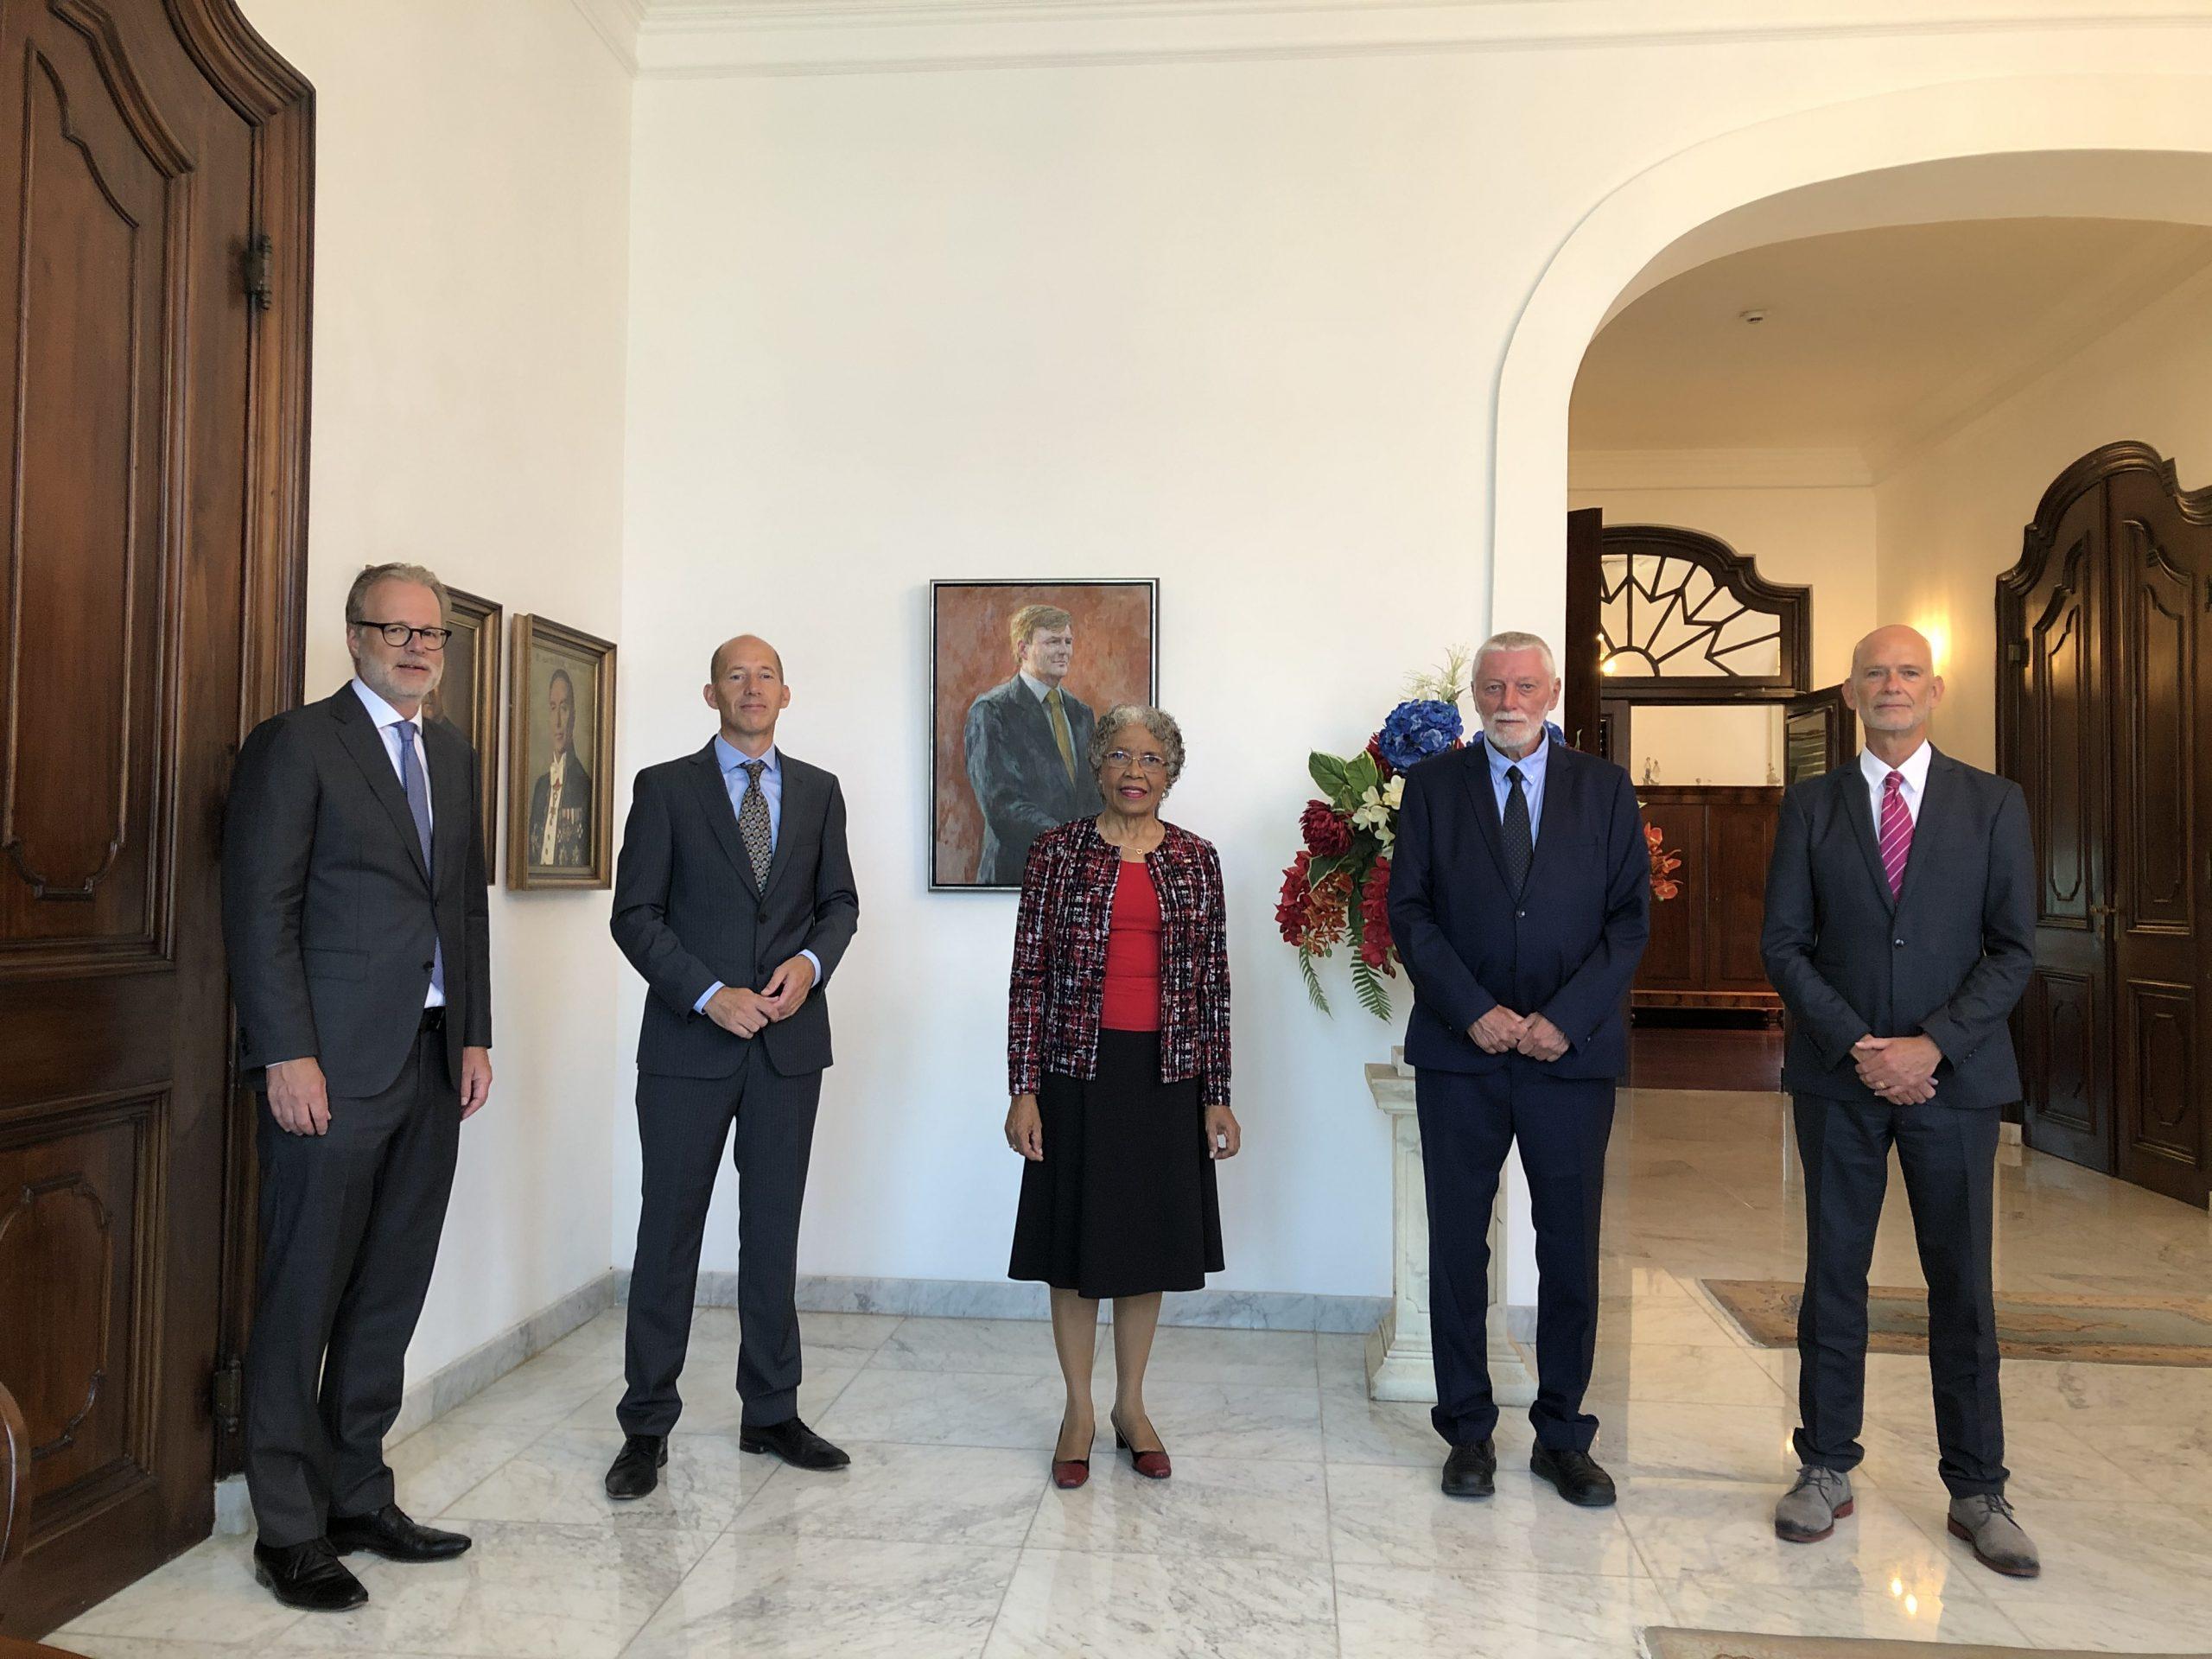 De Gouverneur van Curaçao, H.E. Lucille George-Wout (midden) en (vlnr) de rechters mrs J.A. van Voorthuizen, , O.Nijhuis, G.P. Verbeek en W.H. Bel.